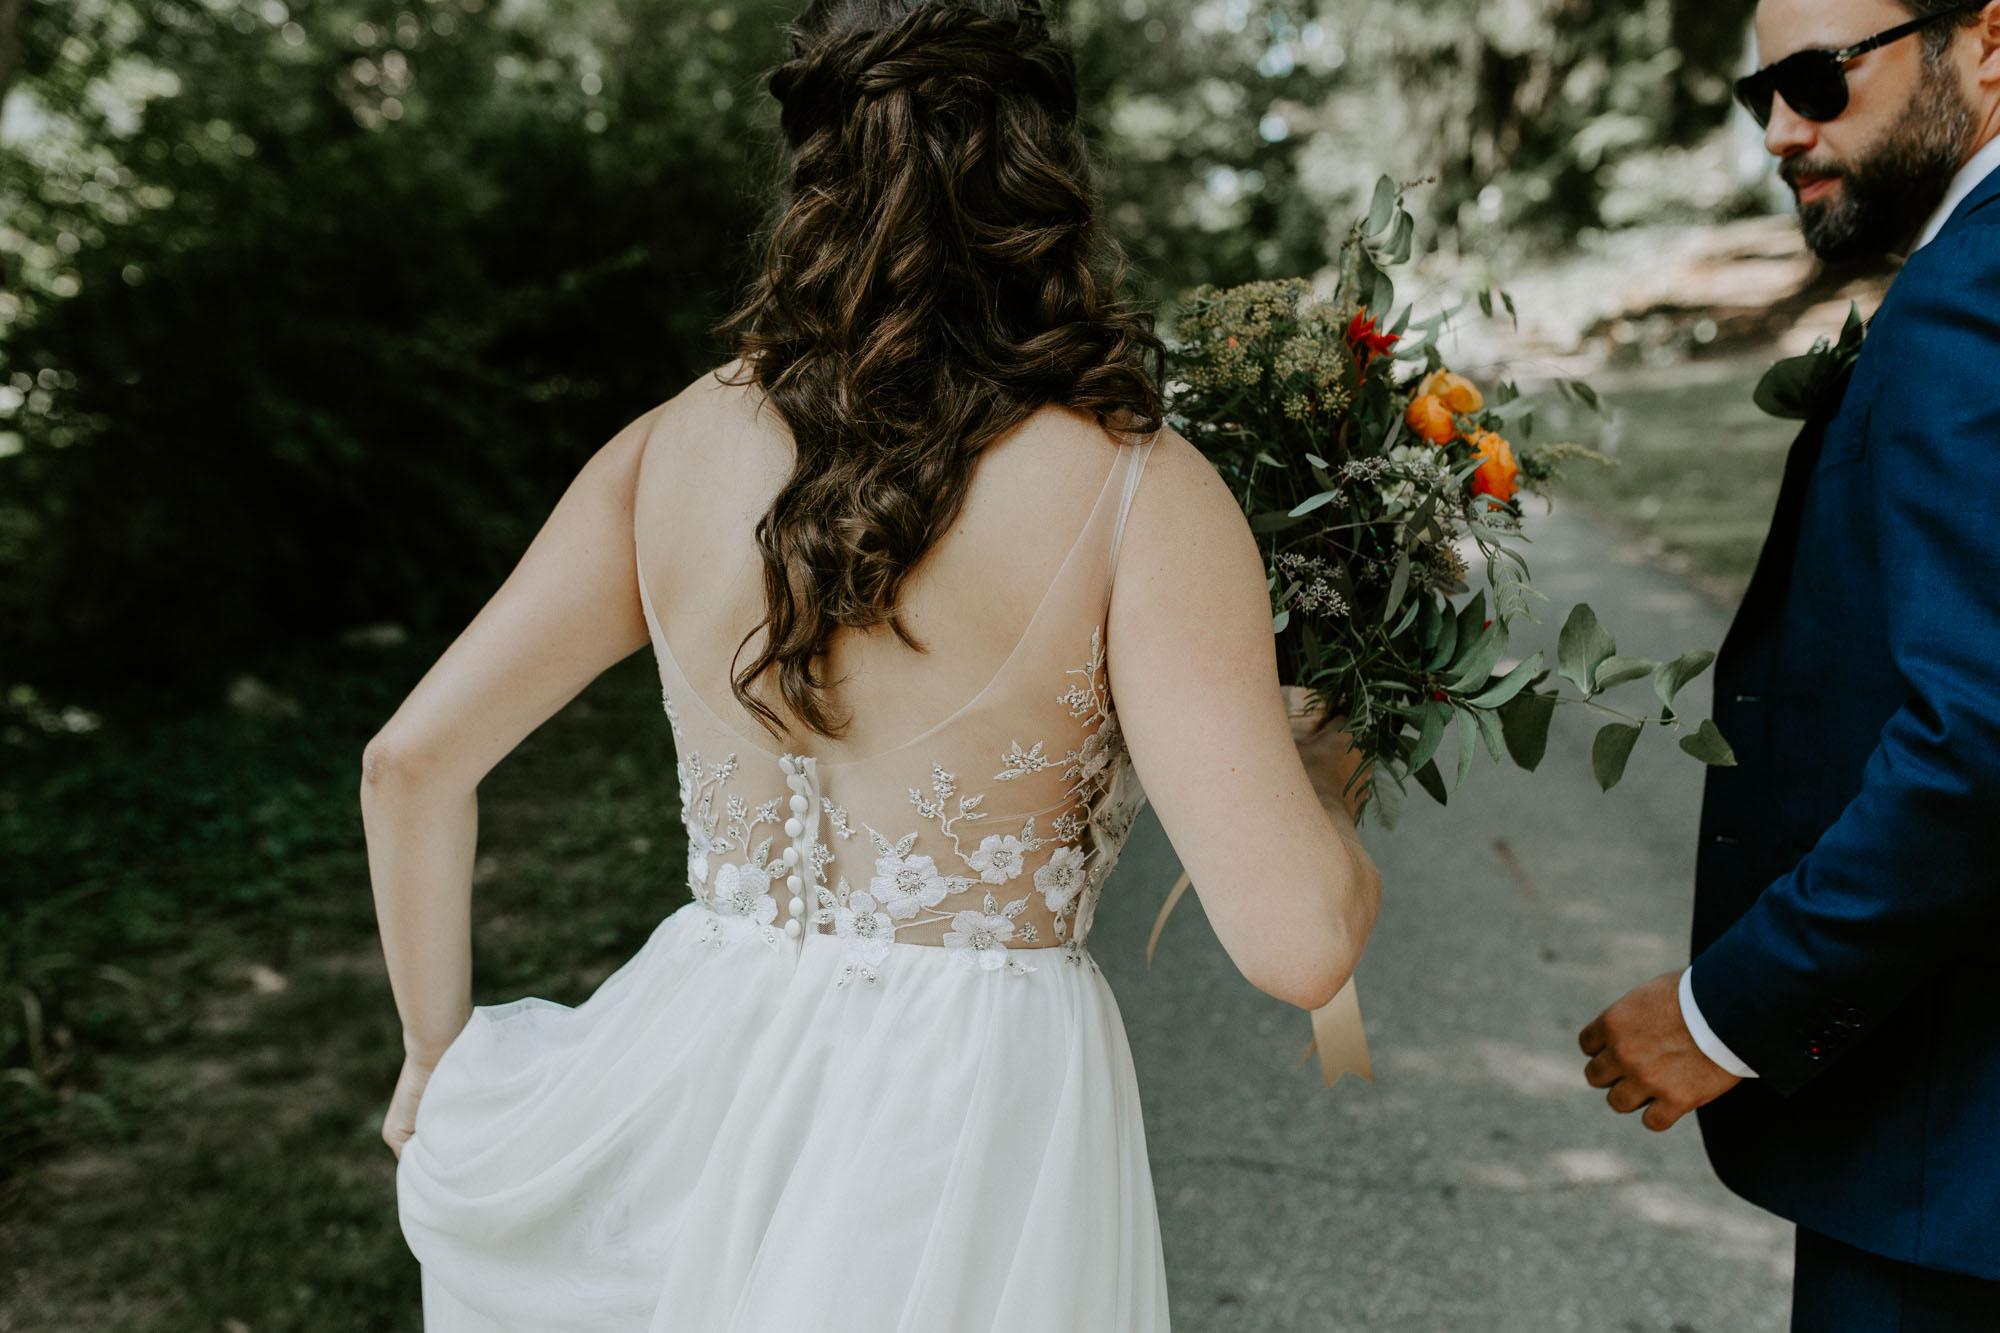 journeyman_distillery_wedding_photographer_chicago_il_wright_photographs-2481.jpg